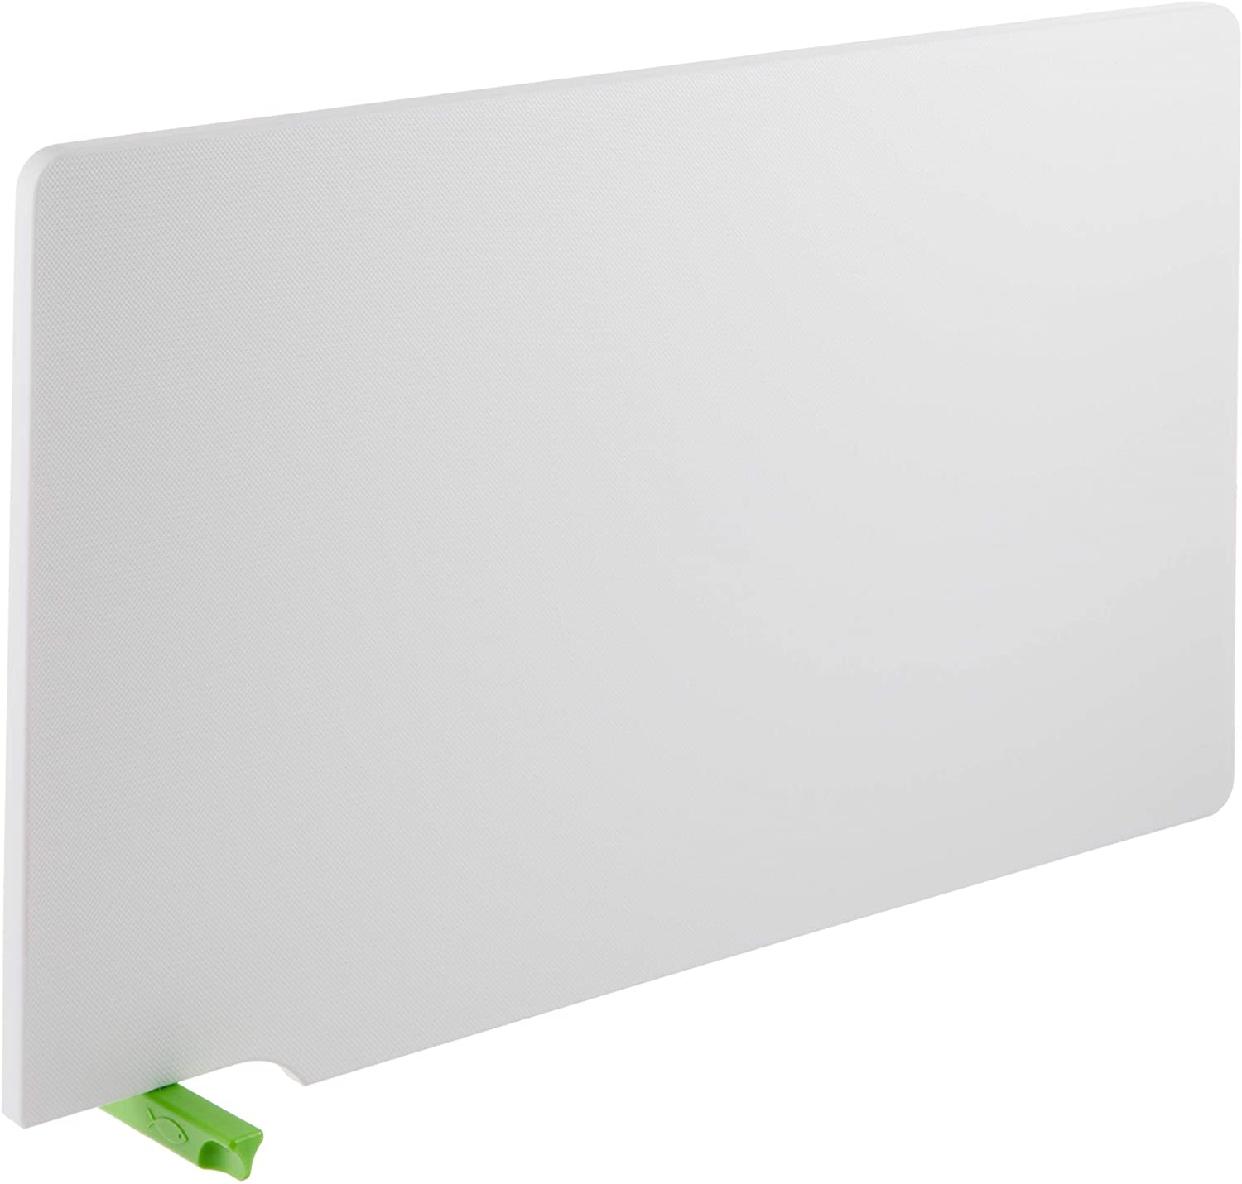 TONBO(トンボ)シンク抗菌まな板 スタンド付 ホワイト&グリーンの商品画像3